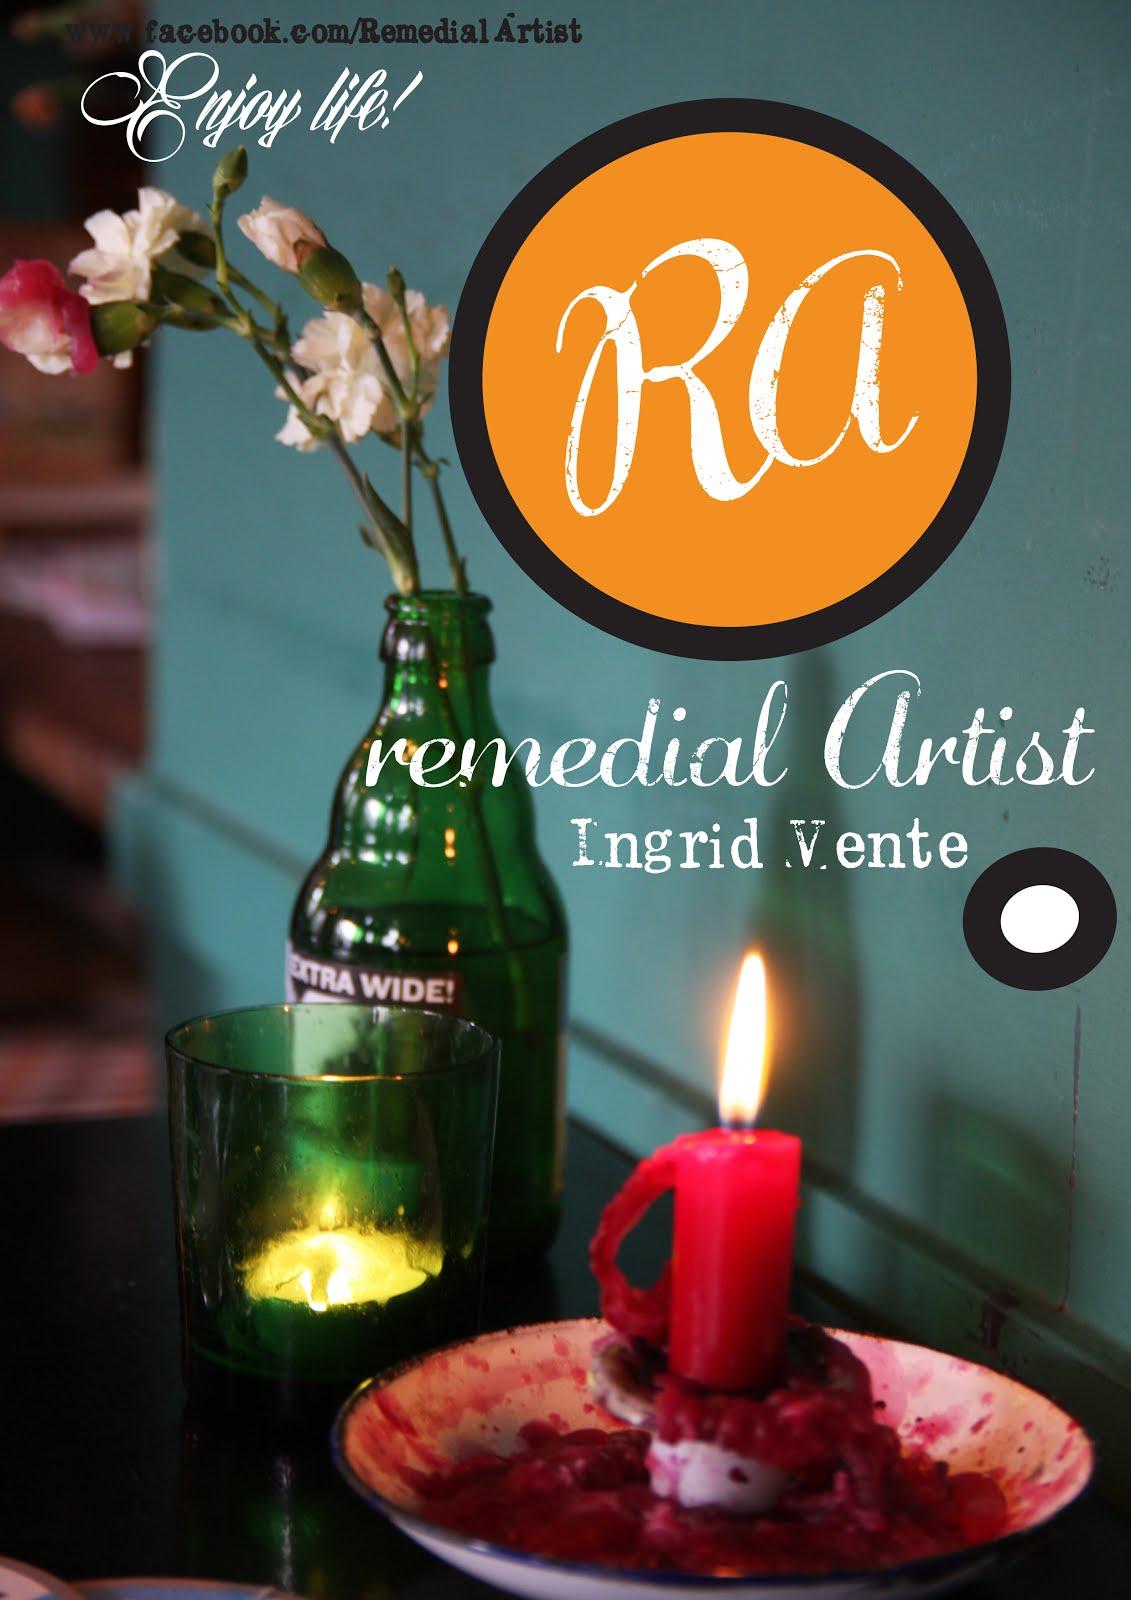 Remedial Artist